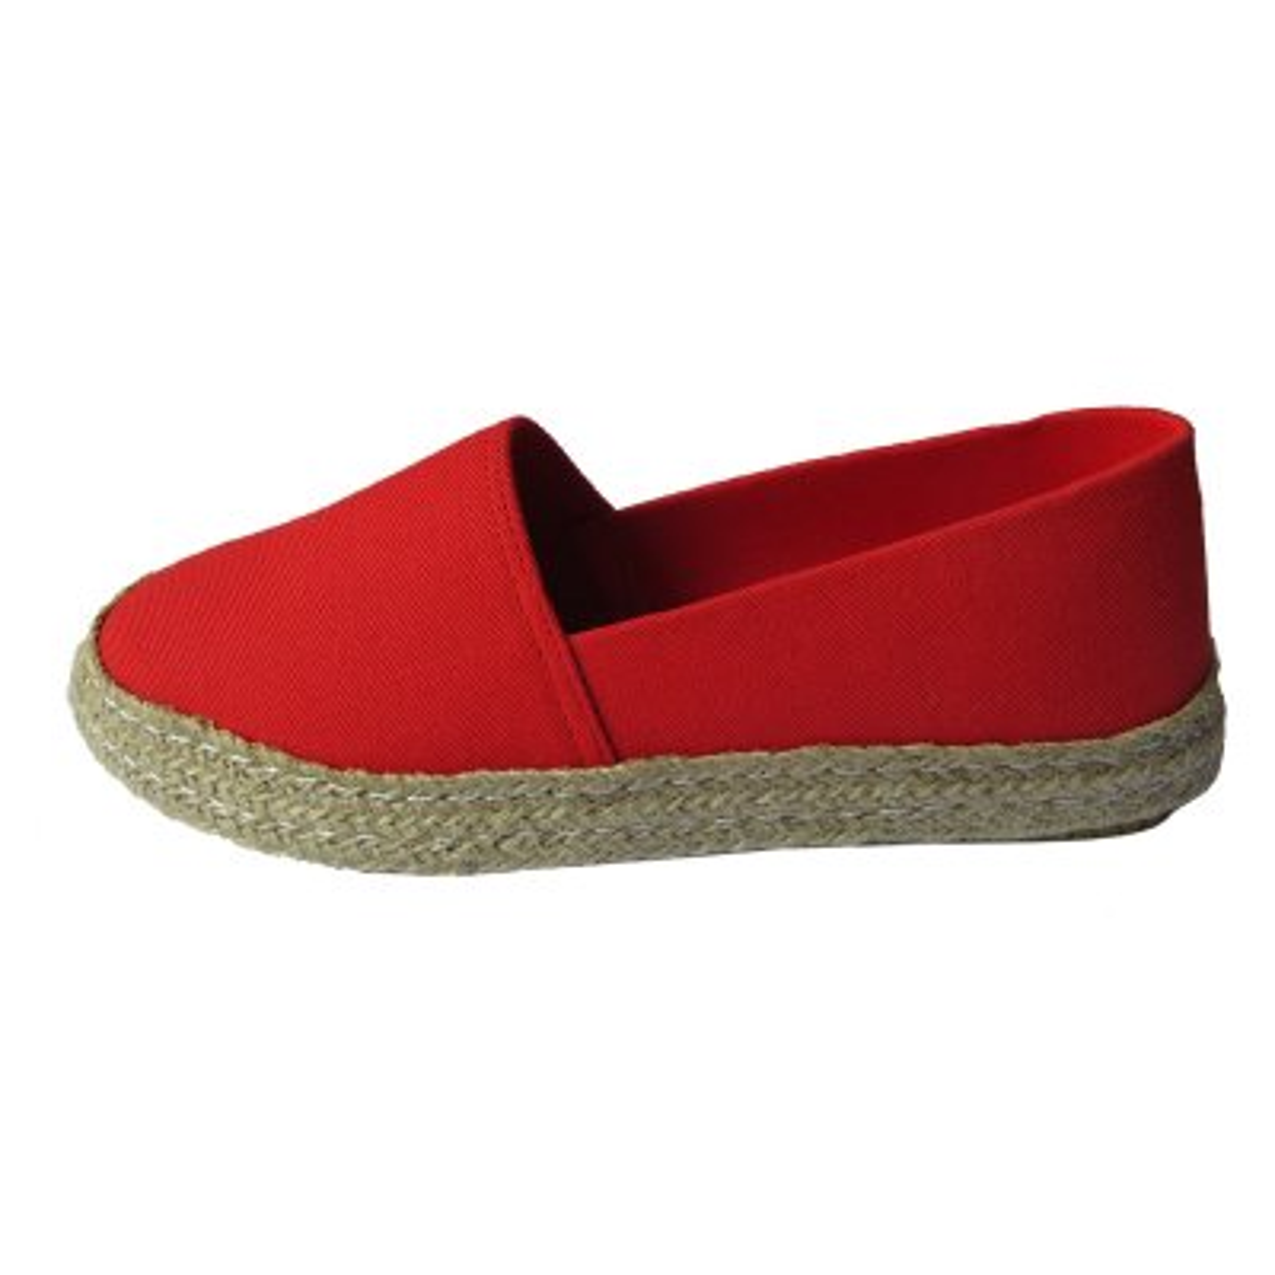 تصویر کفش زنانه طرح گیوه کد G-Me